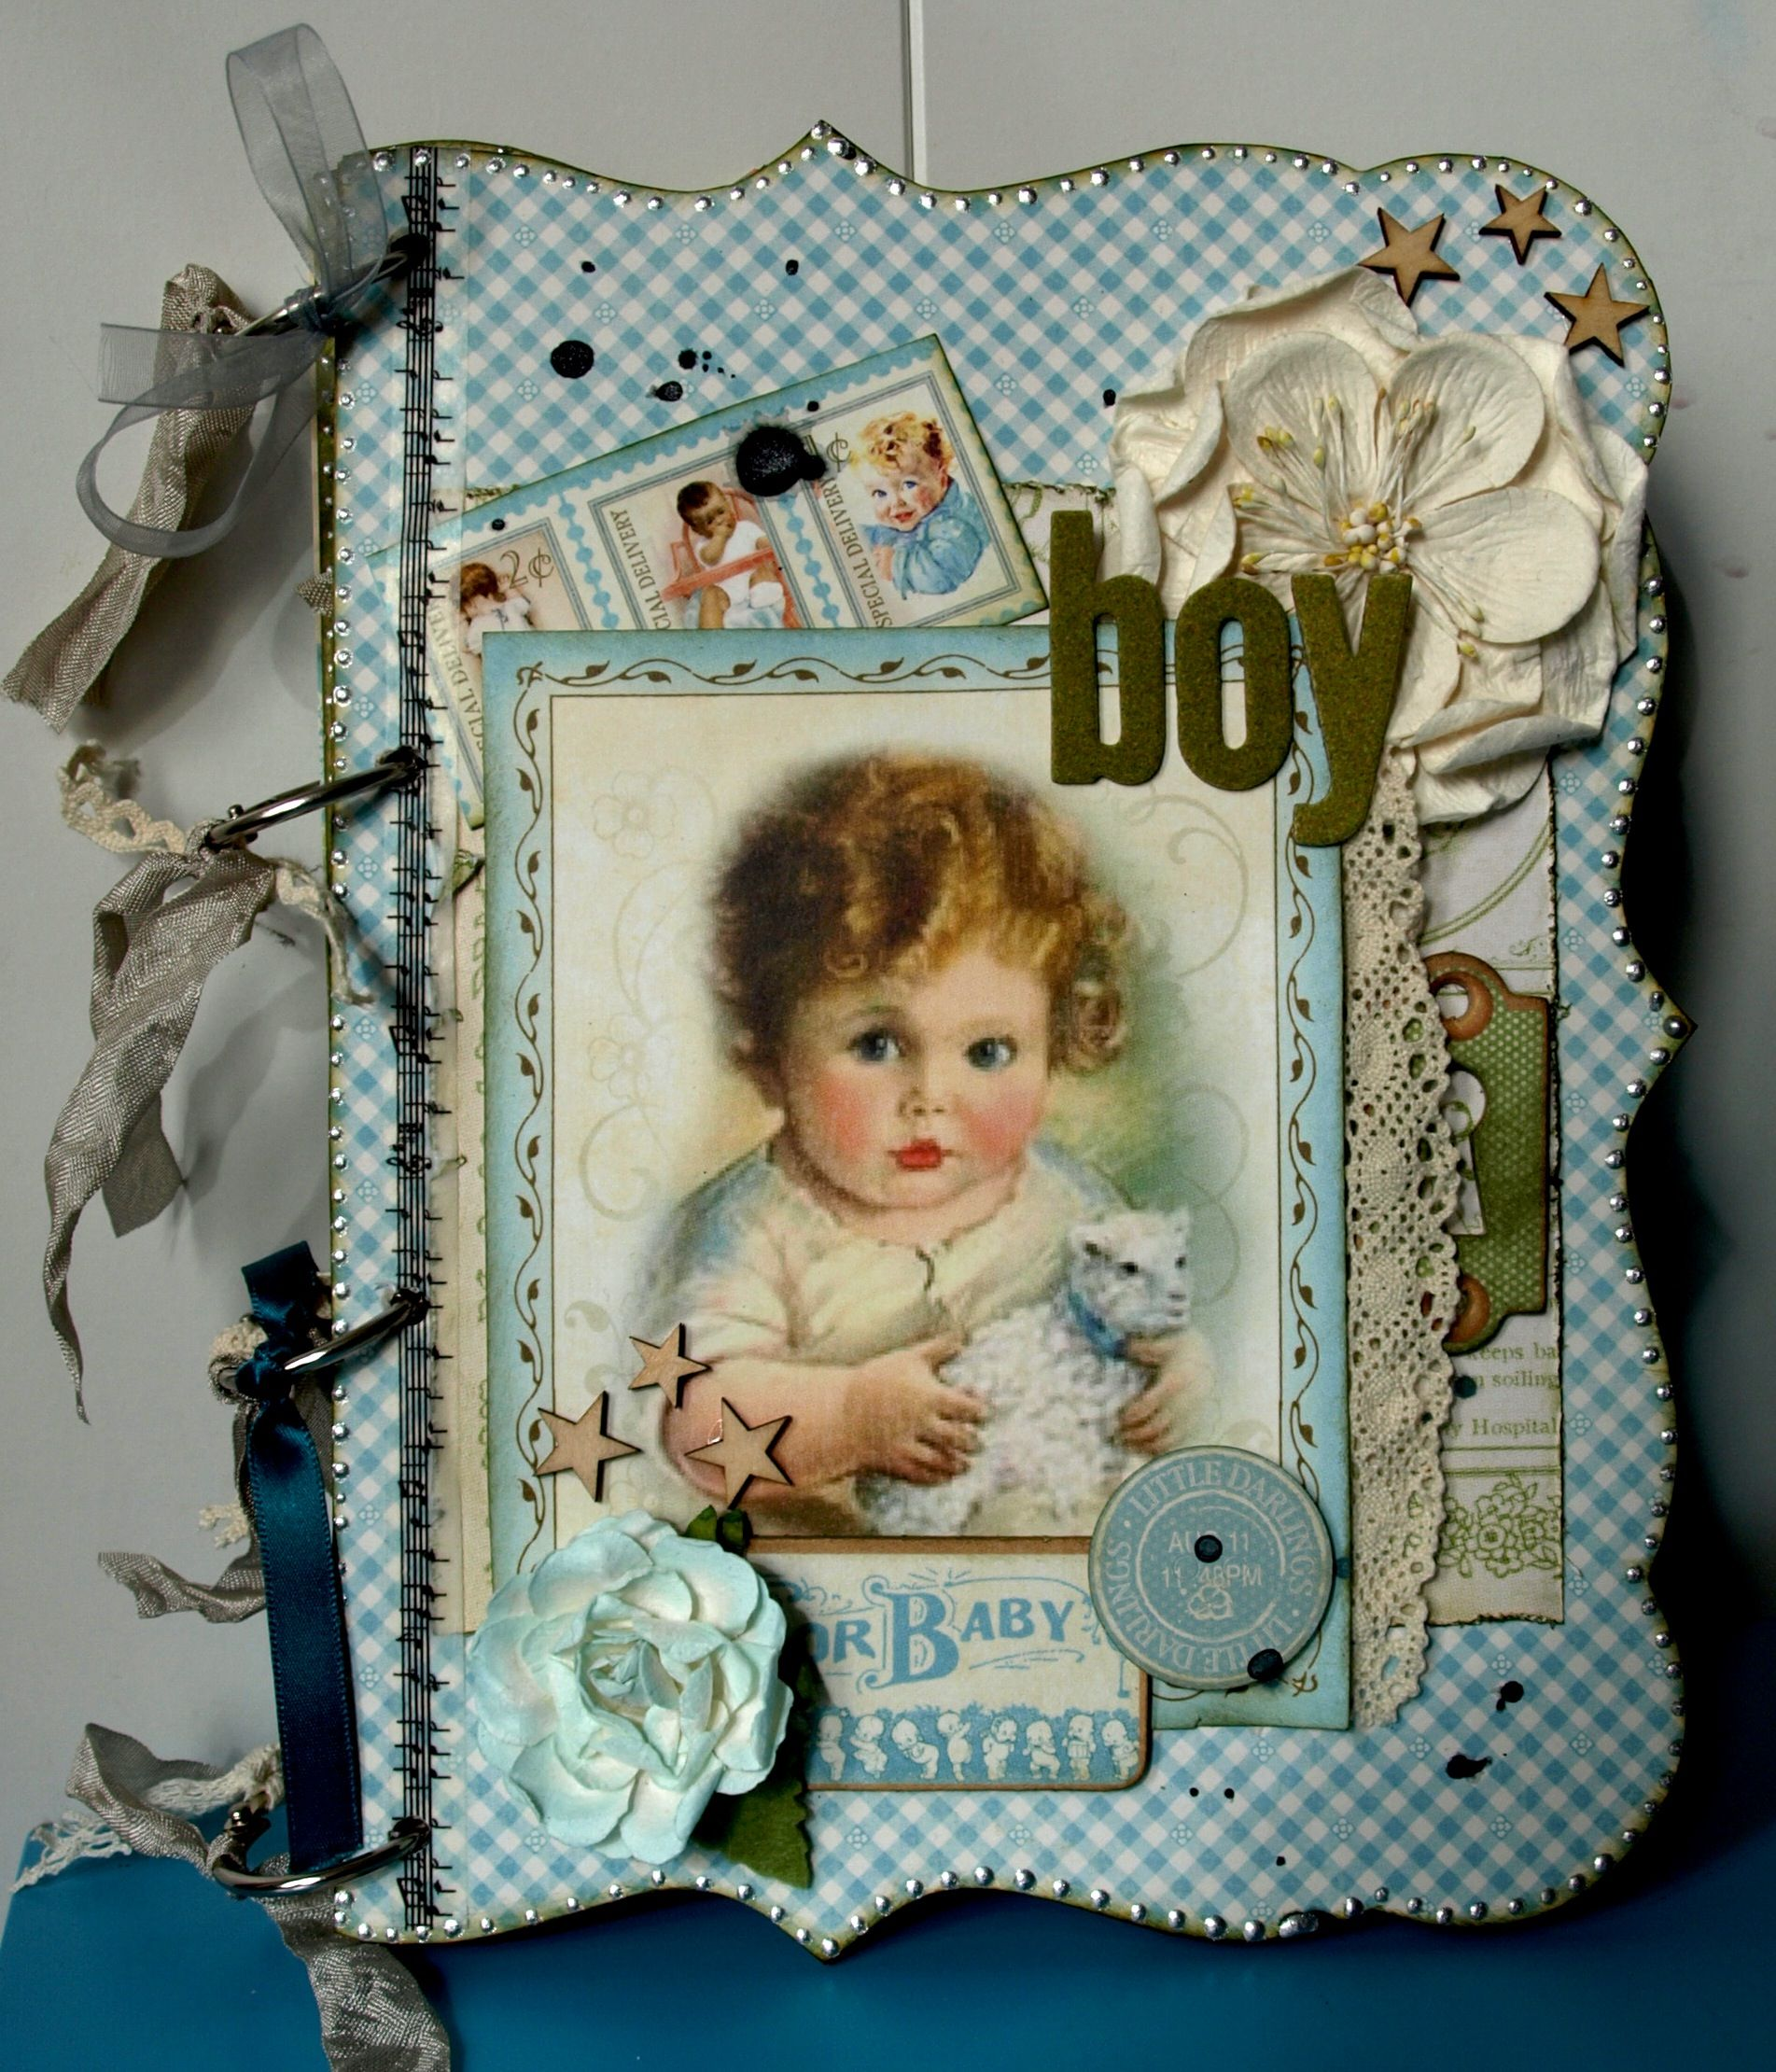 boy mini album mini albums and journals pinterest scrapbook and minis. Black Bedroom Furniture Sets. Home Design Ideas